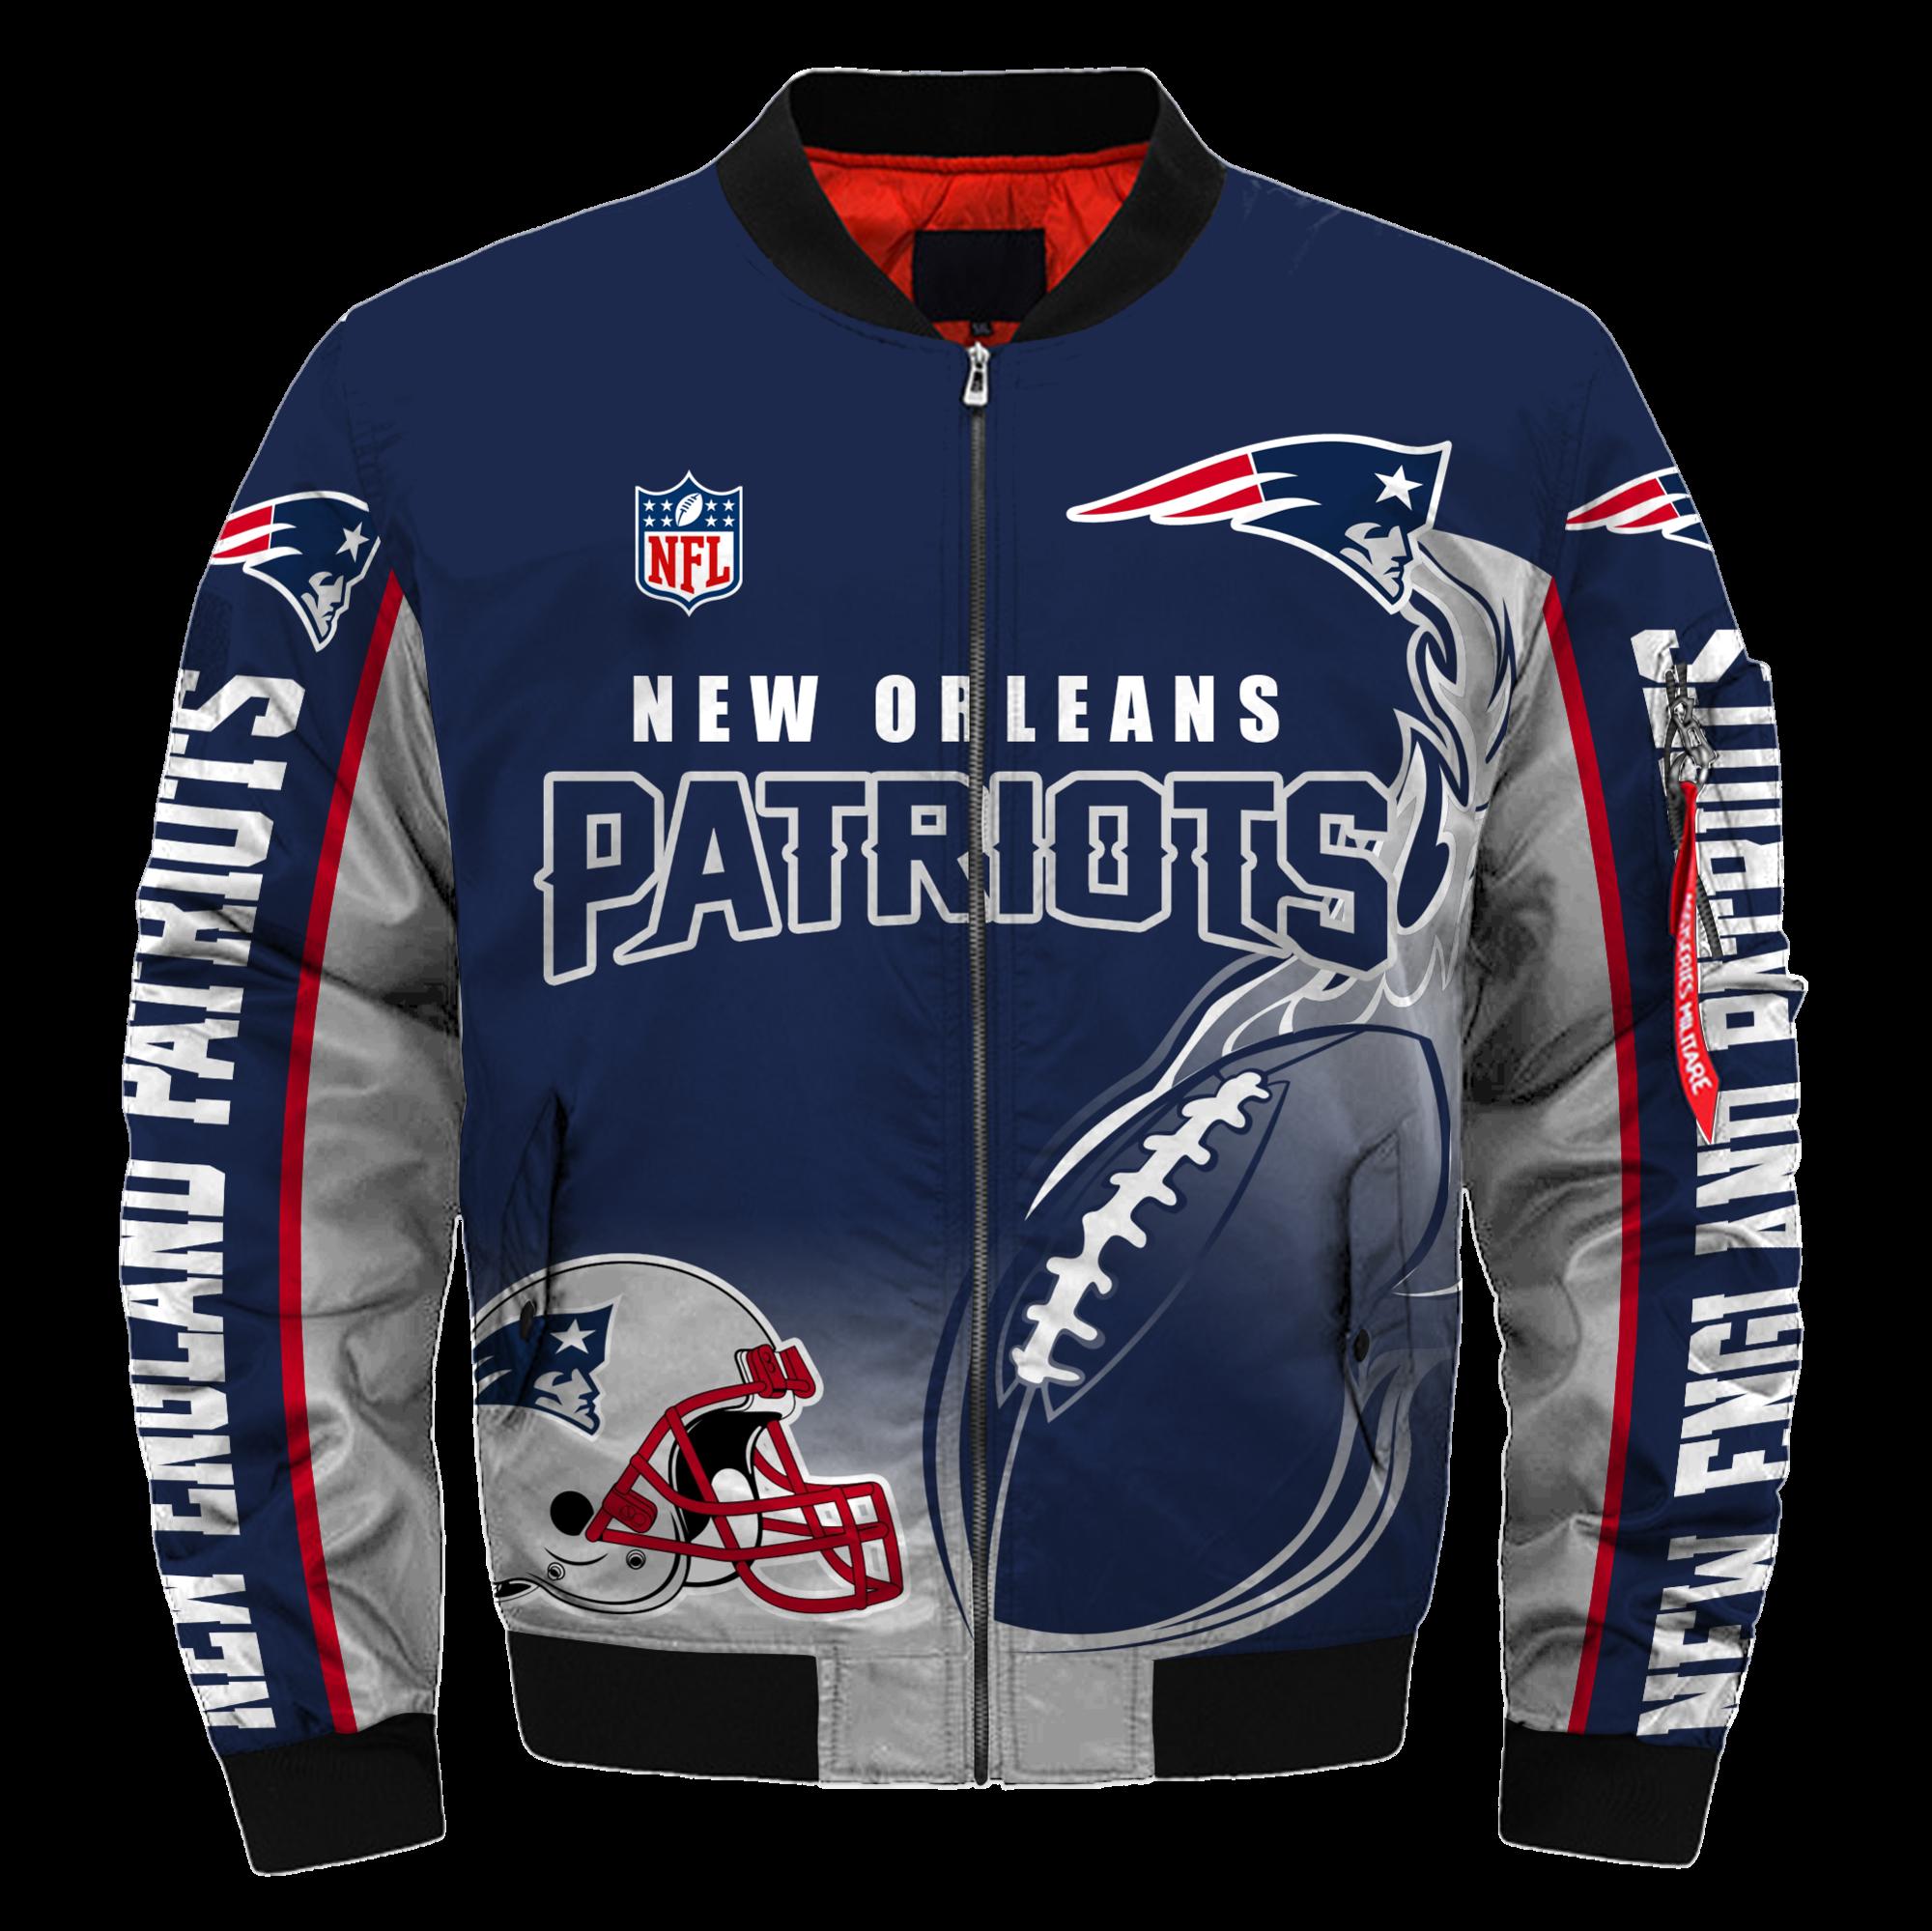 New England Patriots Bomber Jacket Nfl New England Patriots Apparel Https Fanaticssport Com New England Patriots Apparel Nfl New England Patriots New England Patriots